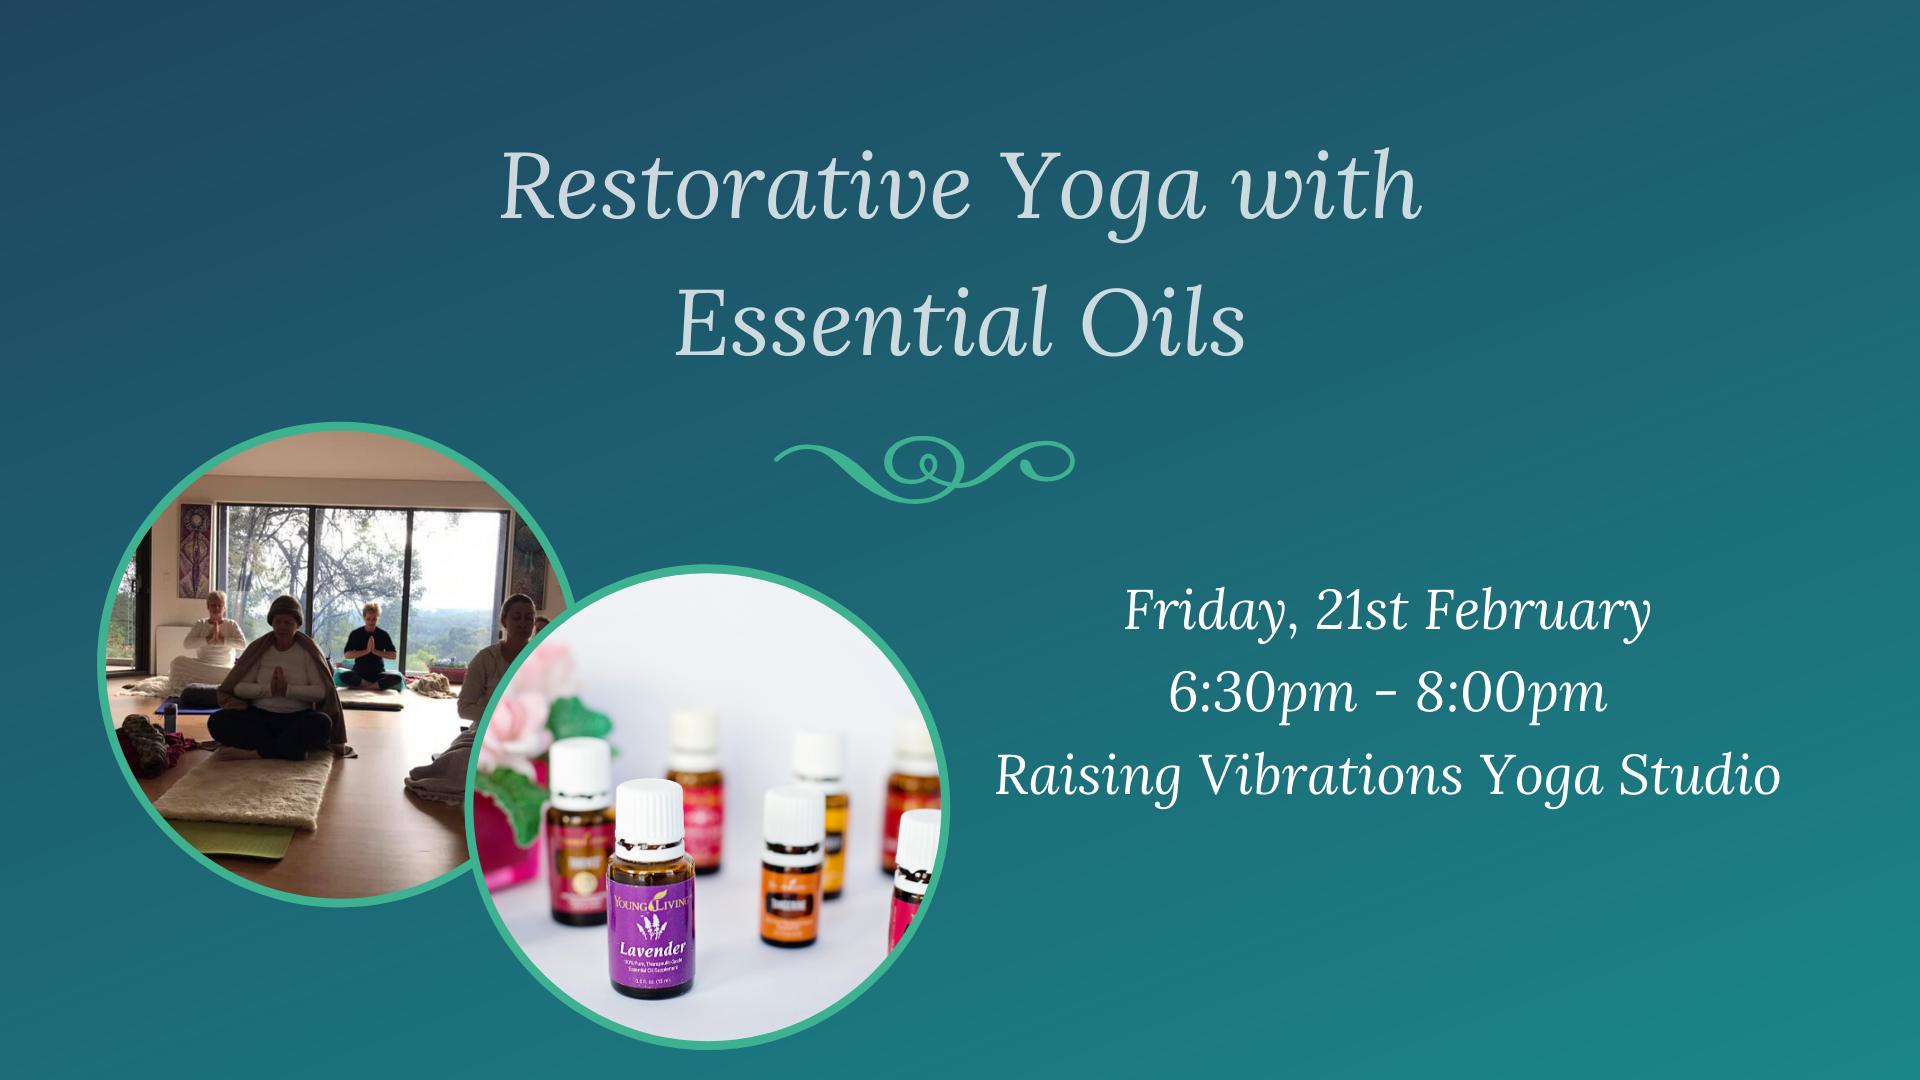 Restorative Yoga with Essential Oil